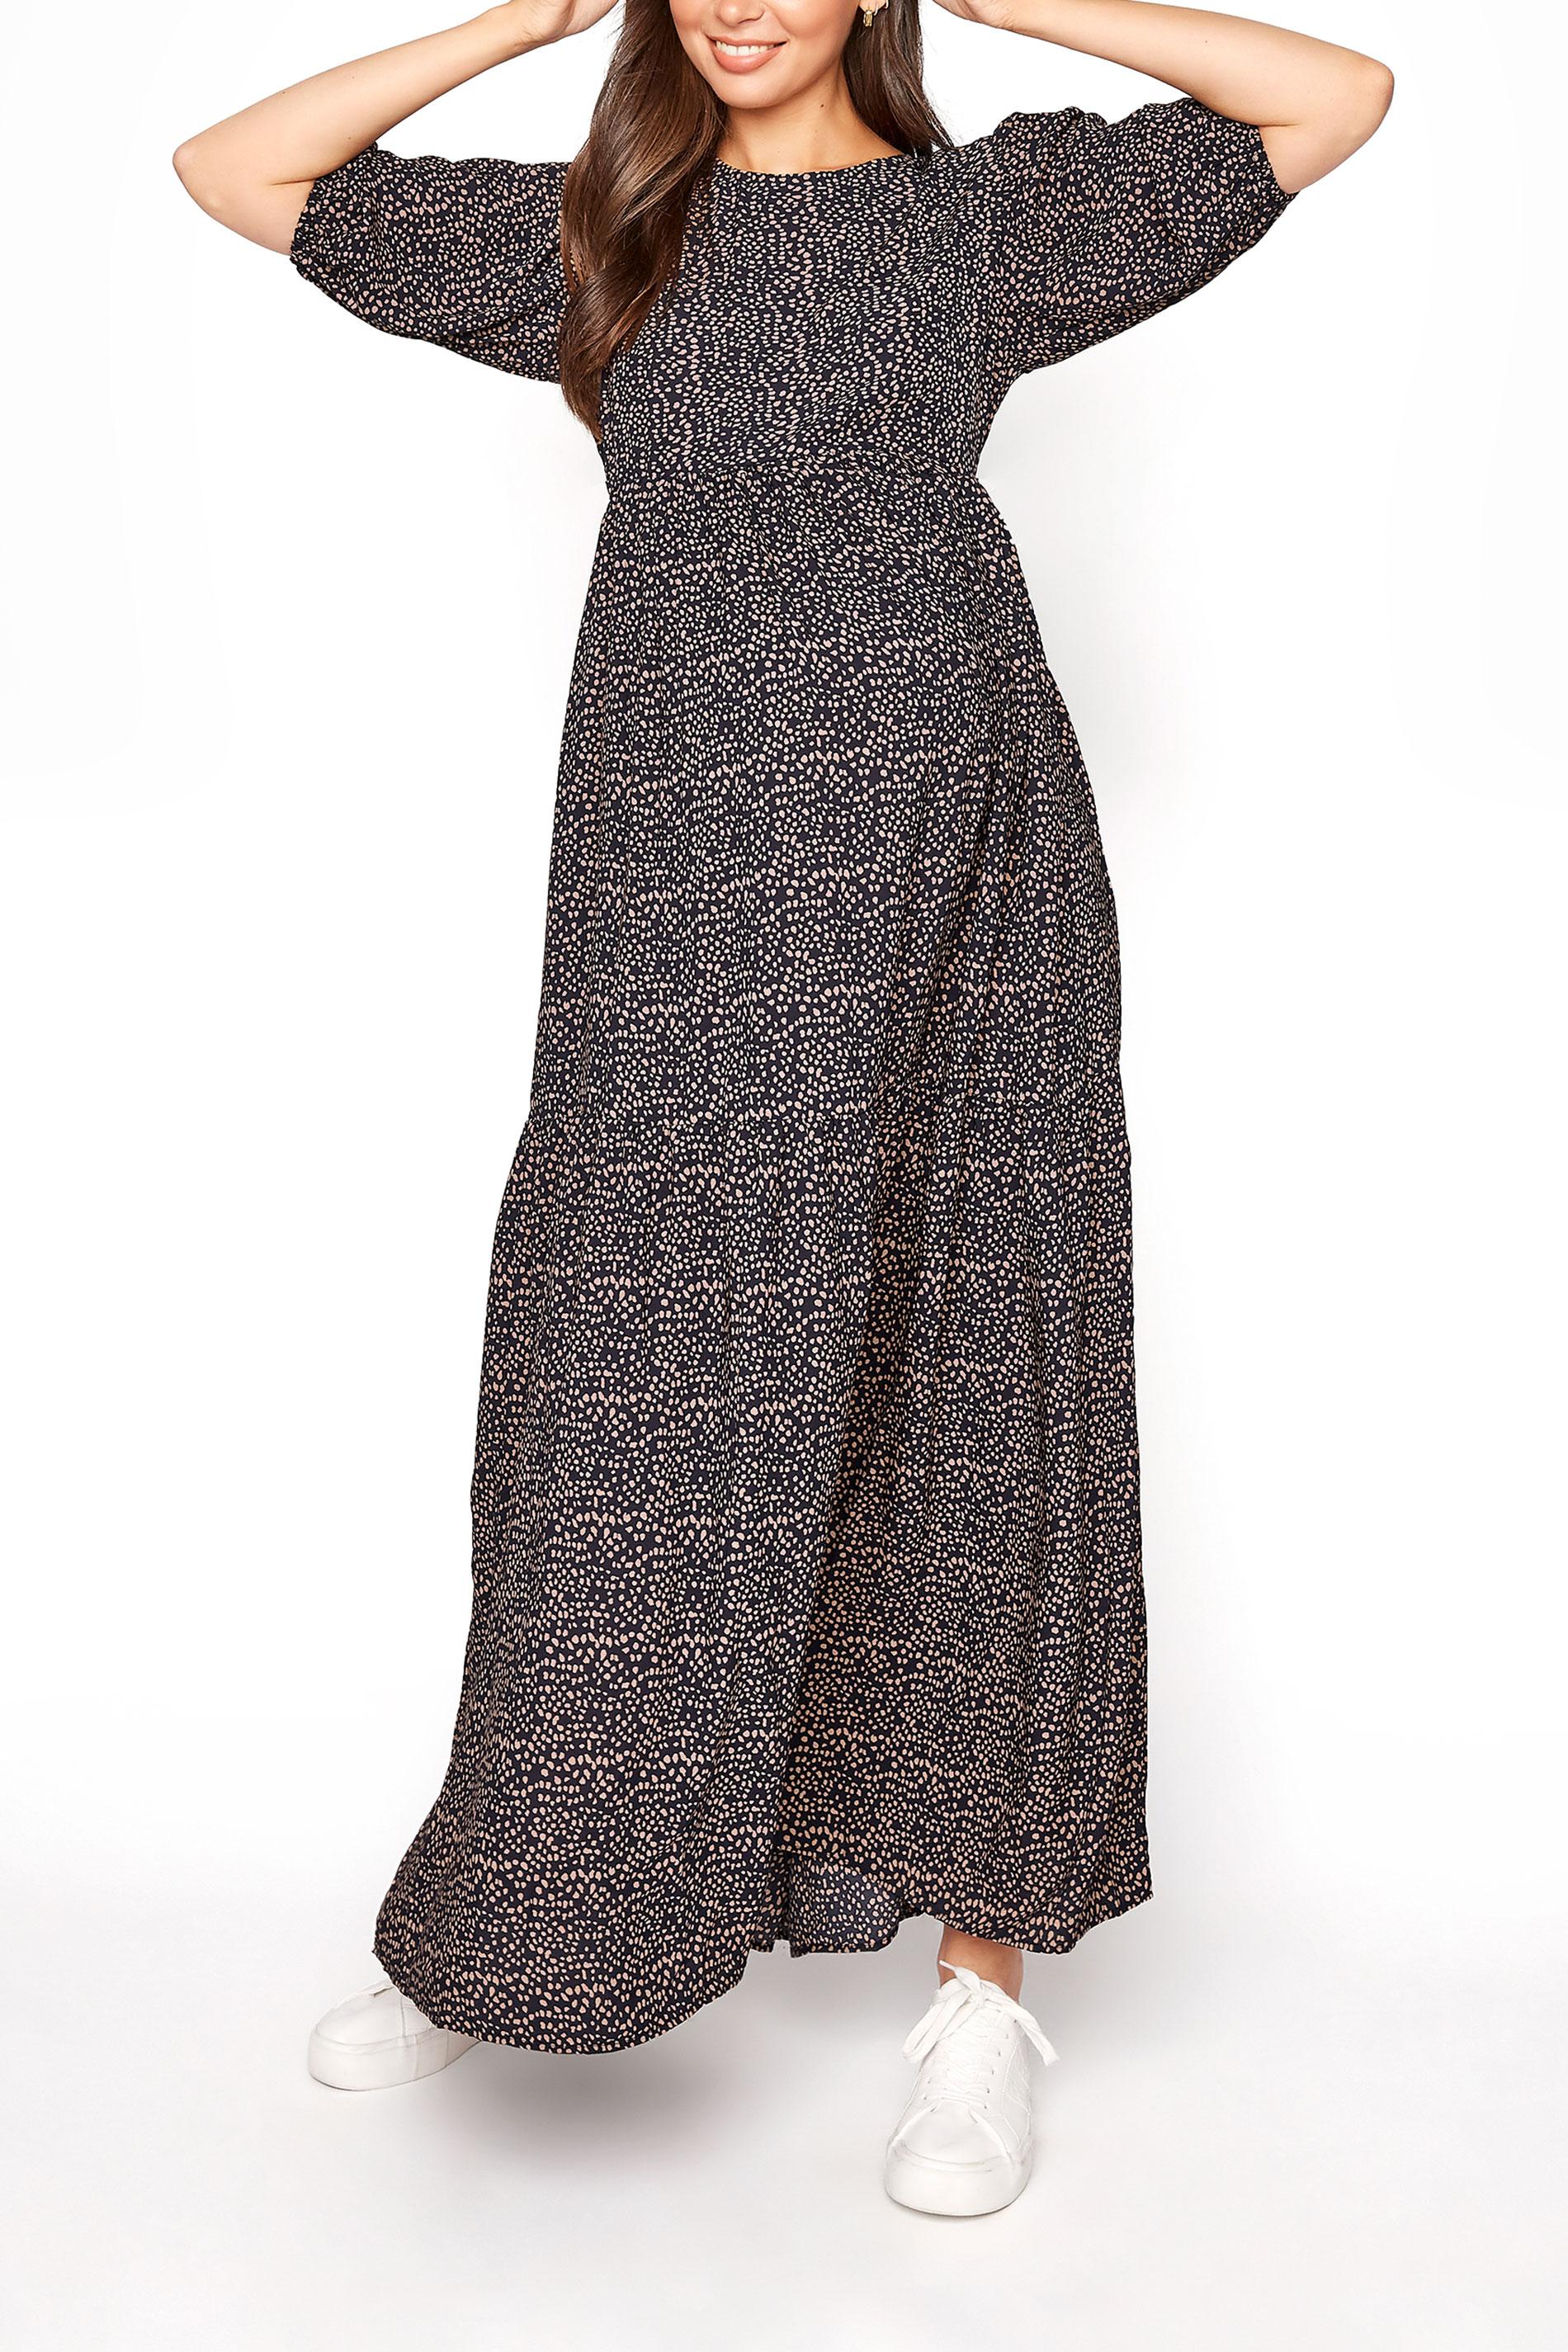 LTS Maternity Navy Speckled Smock Maxi Dress_A.jpg